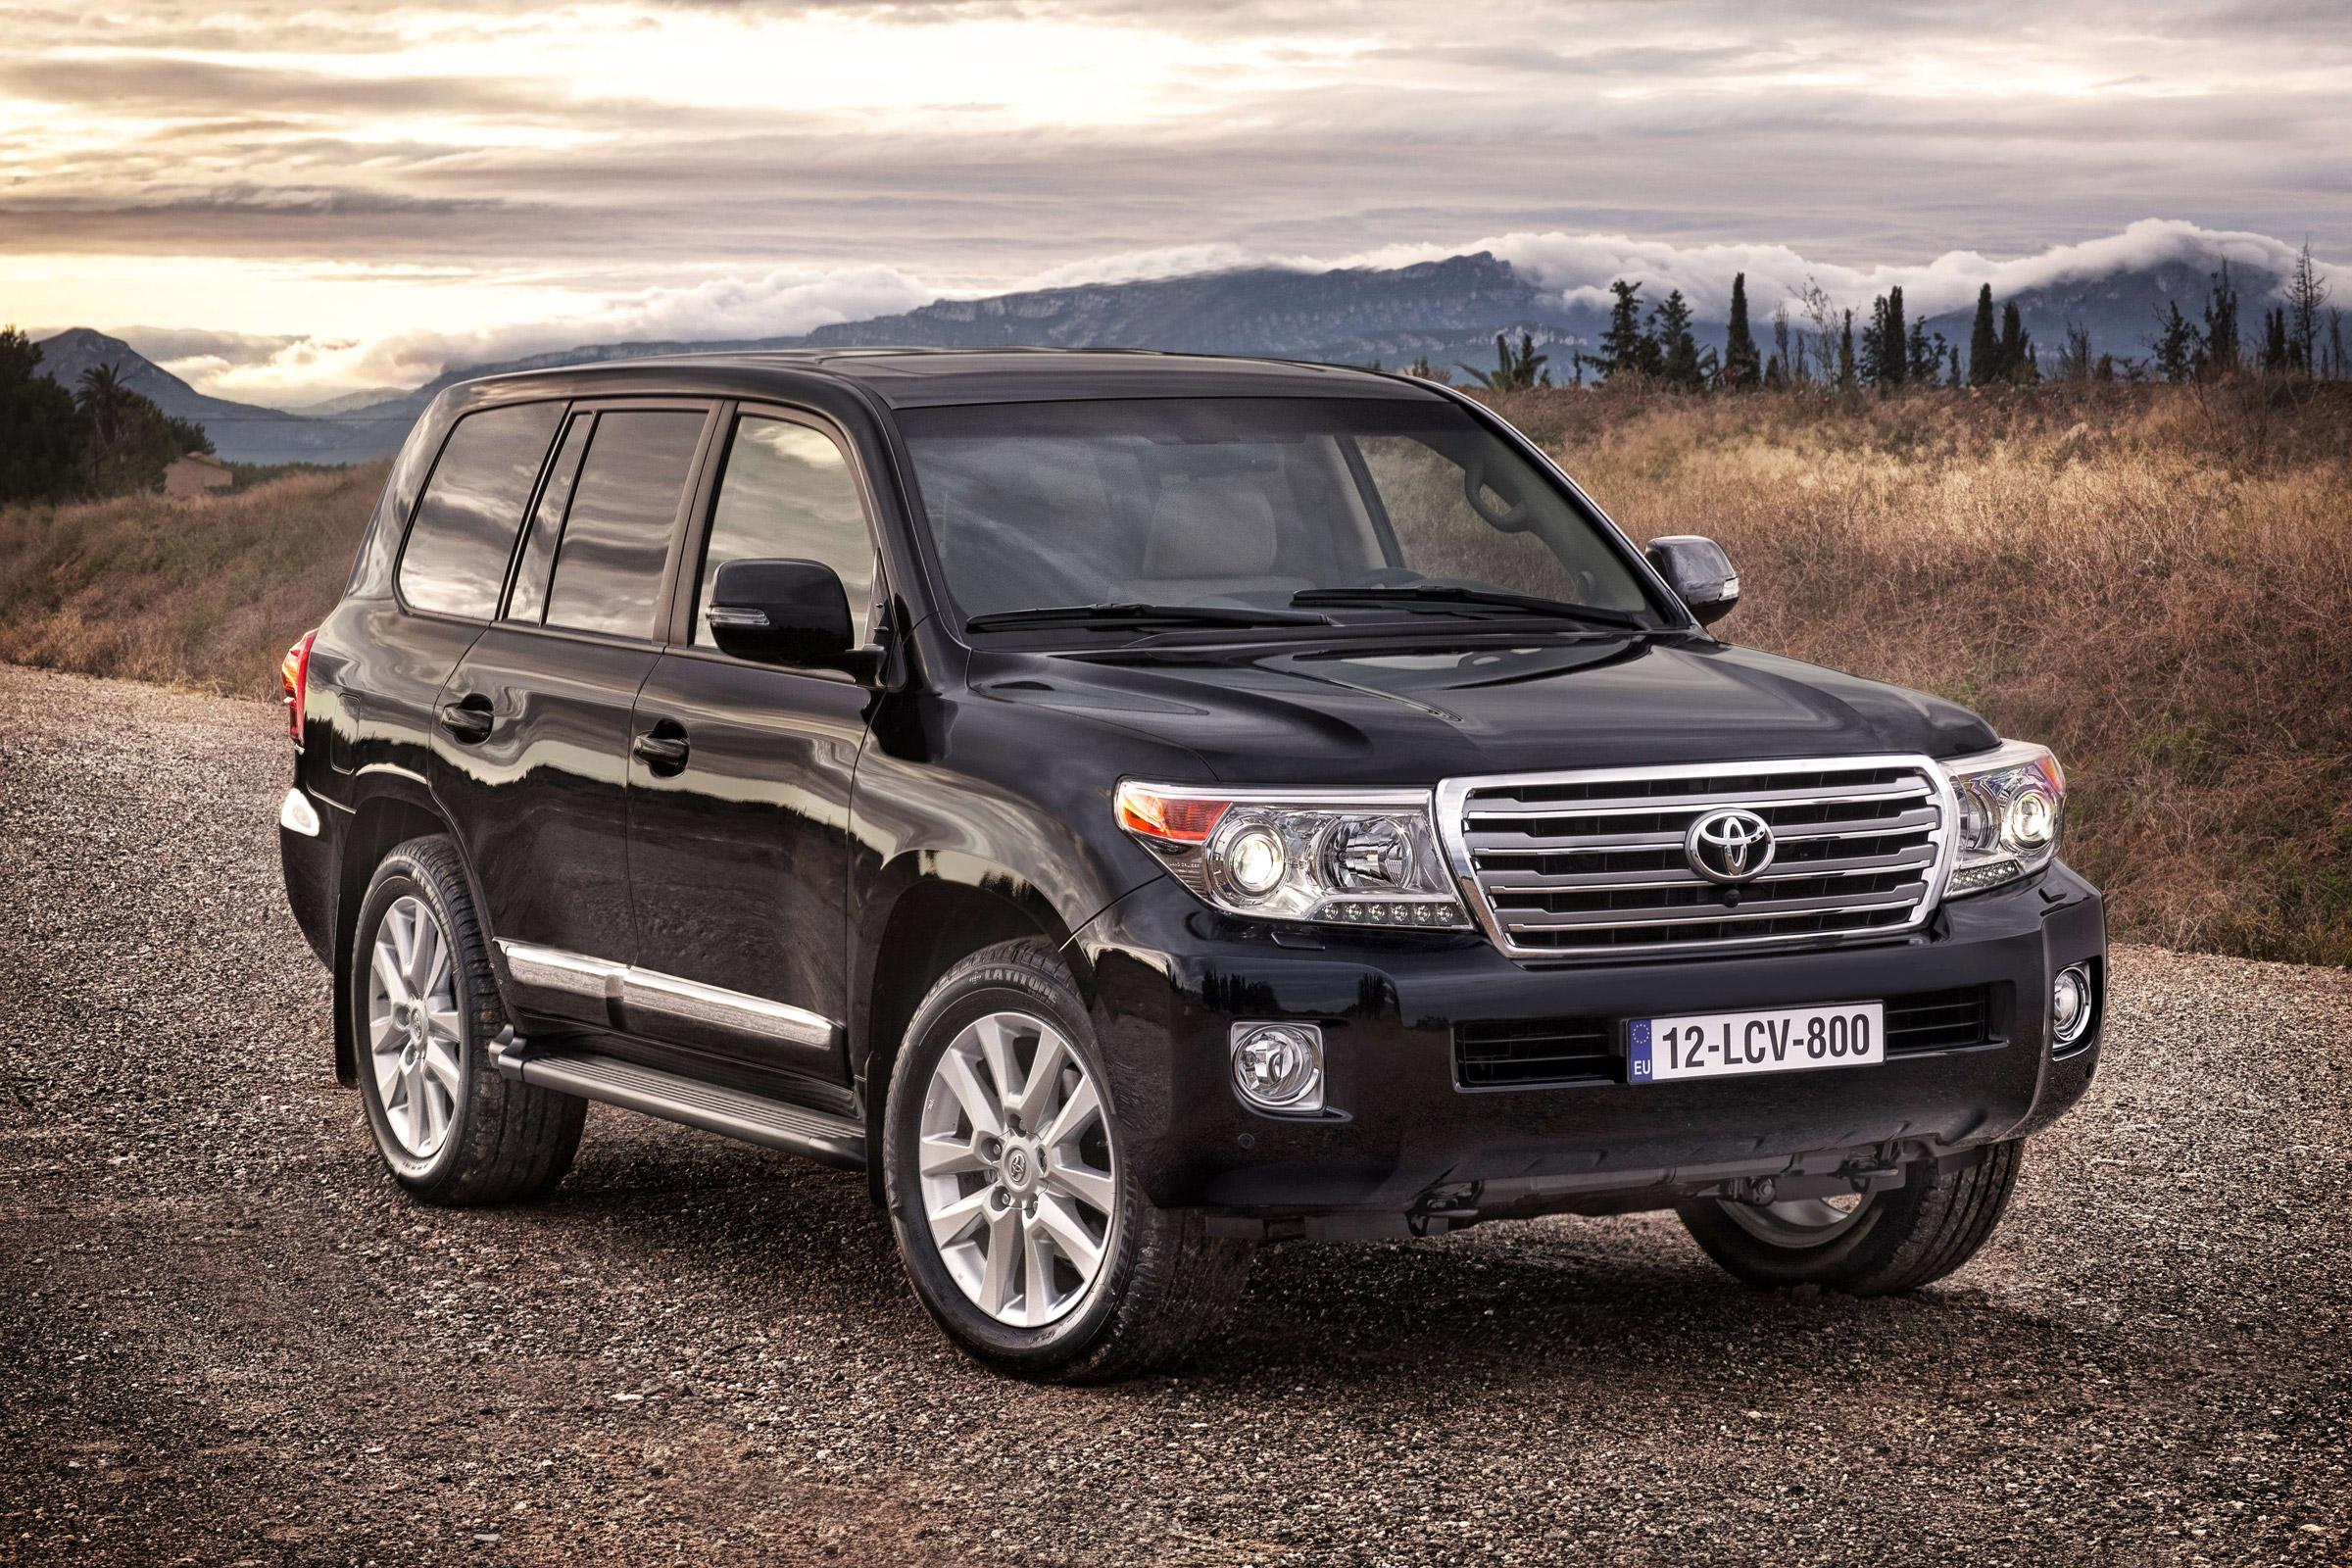 Kelebihan Kekurangan Toyota Land Cruiser V8 2018 Murah Berkualitas